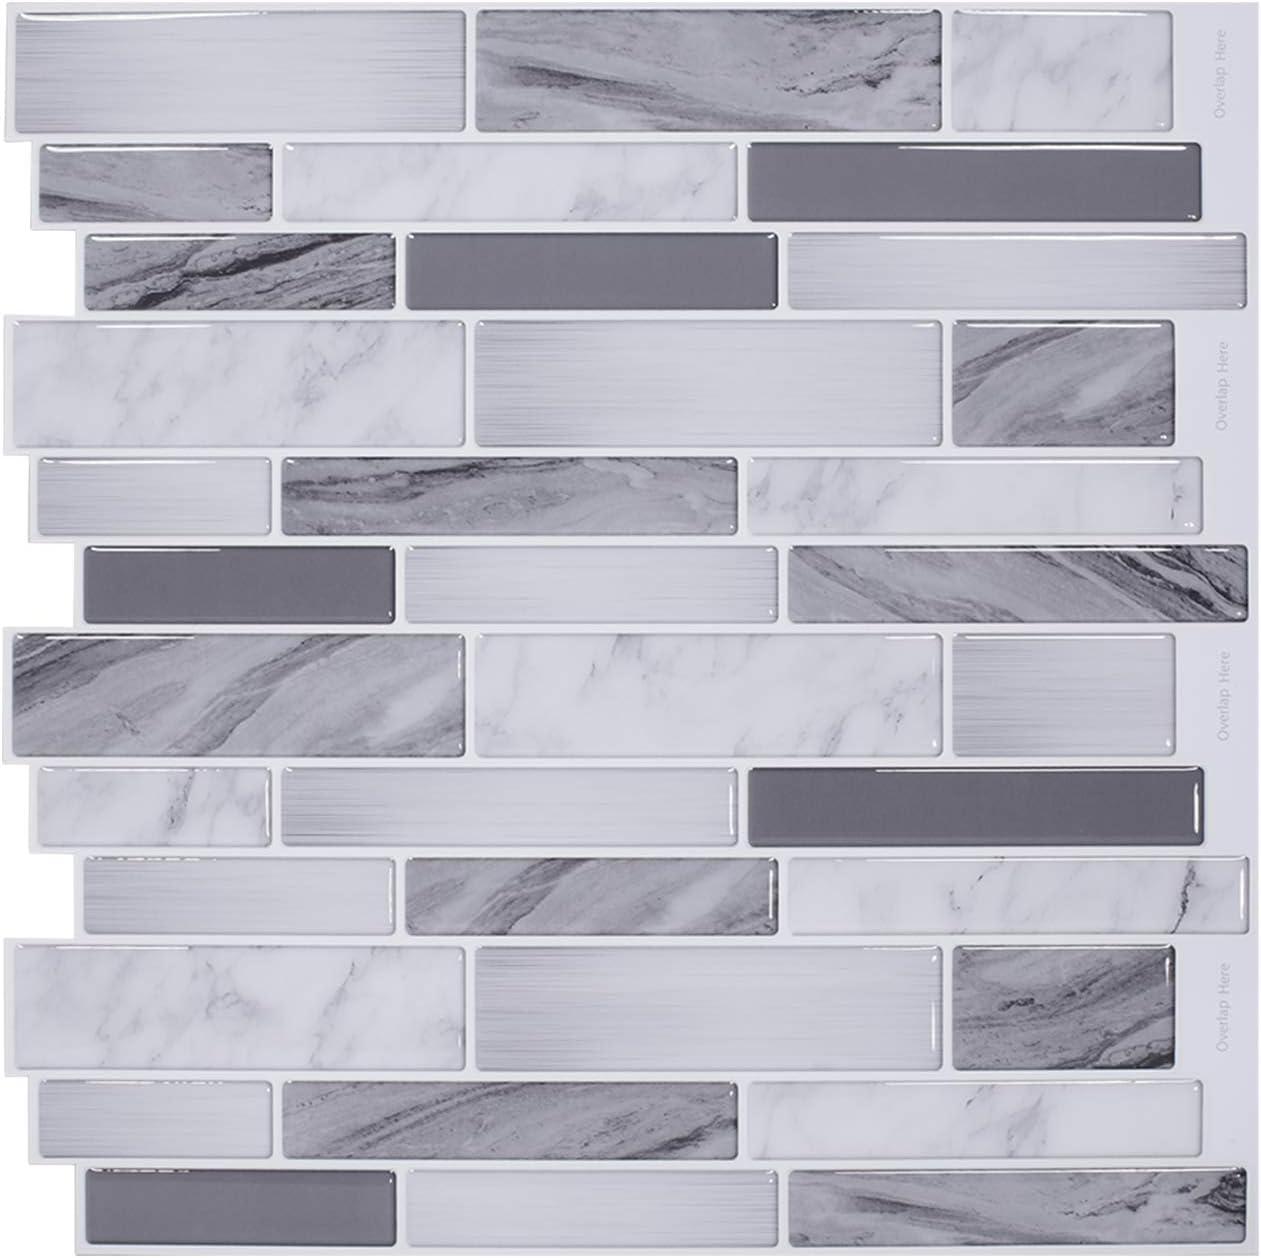 Amazon Com Vamos Tile 12 X 12 Premium Peel And Stick Tiles Backsplash Stick On Kitchen Backsplash Bathroom Wall Tile 10 Sheets Home Kitchen